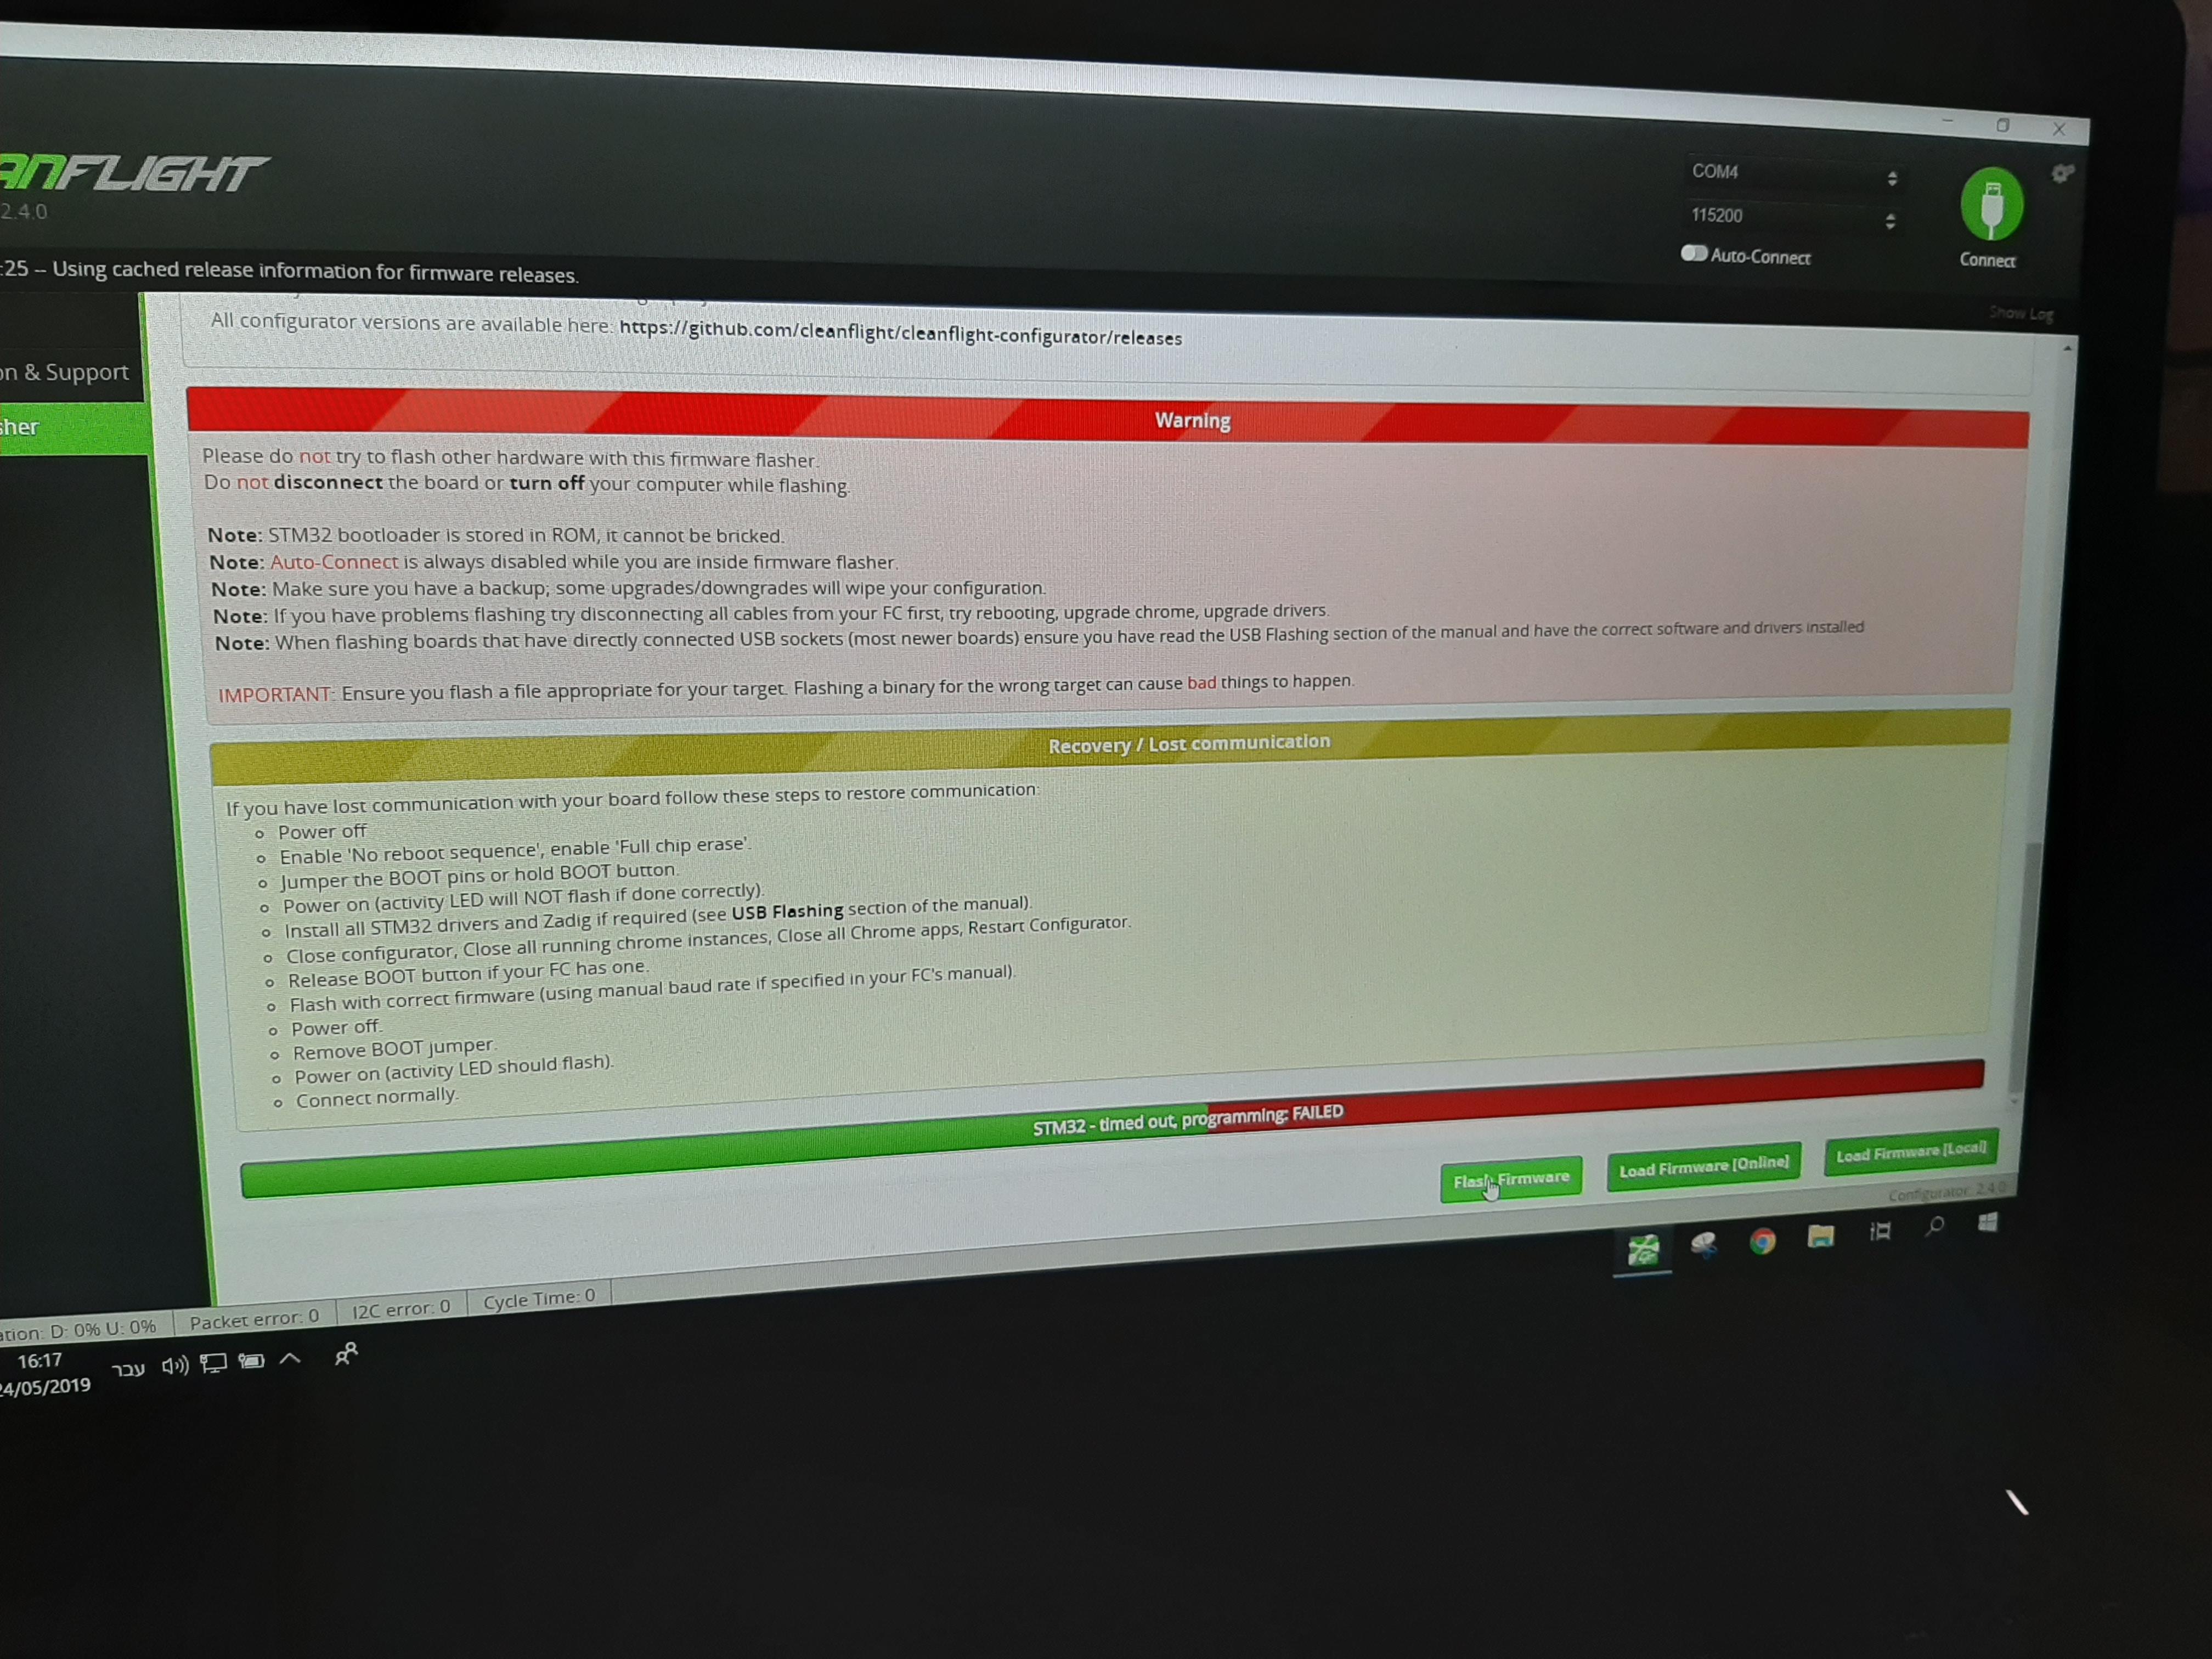 Stm32 timede out problem - Help - DroneTrest